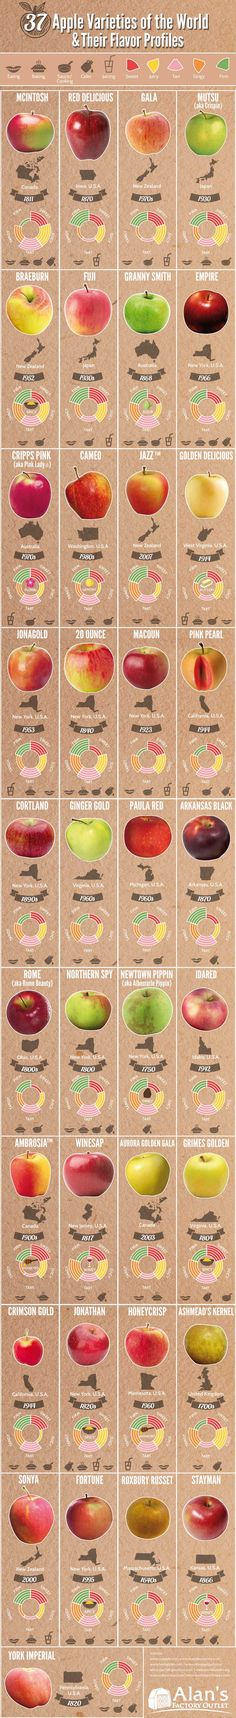 37 Apple Varieties Around the World & Their Flavor Profiles